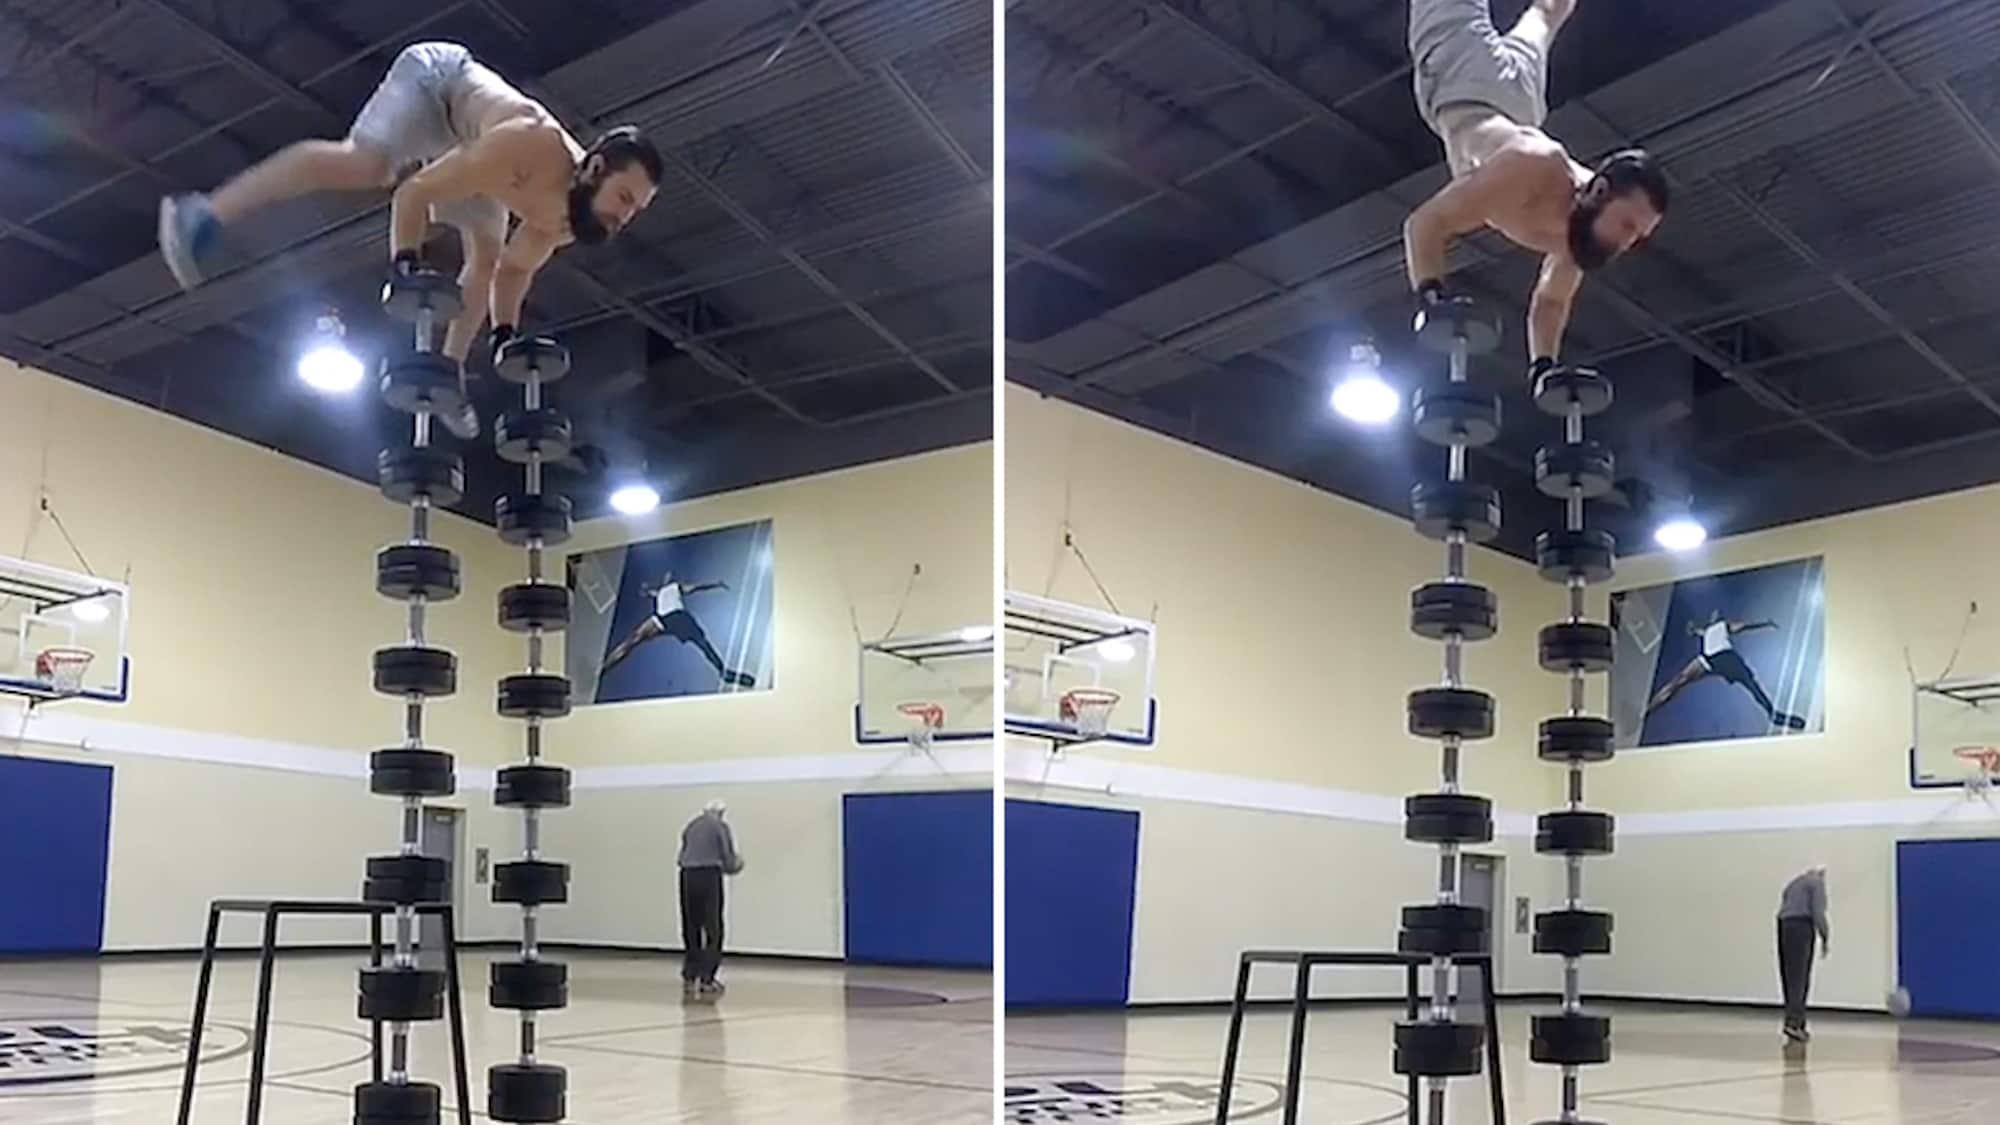 Alles im Gleichgewicht: Fitness-Freak protzt mit kurioser Akrobatik